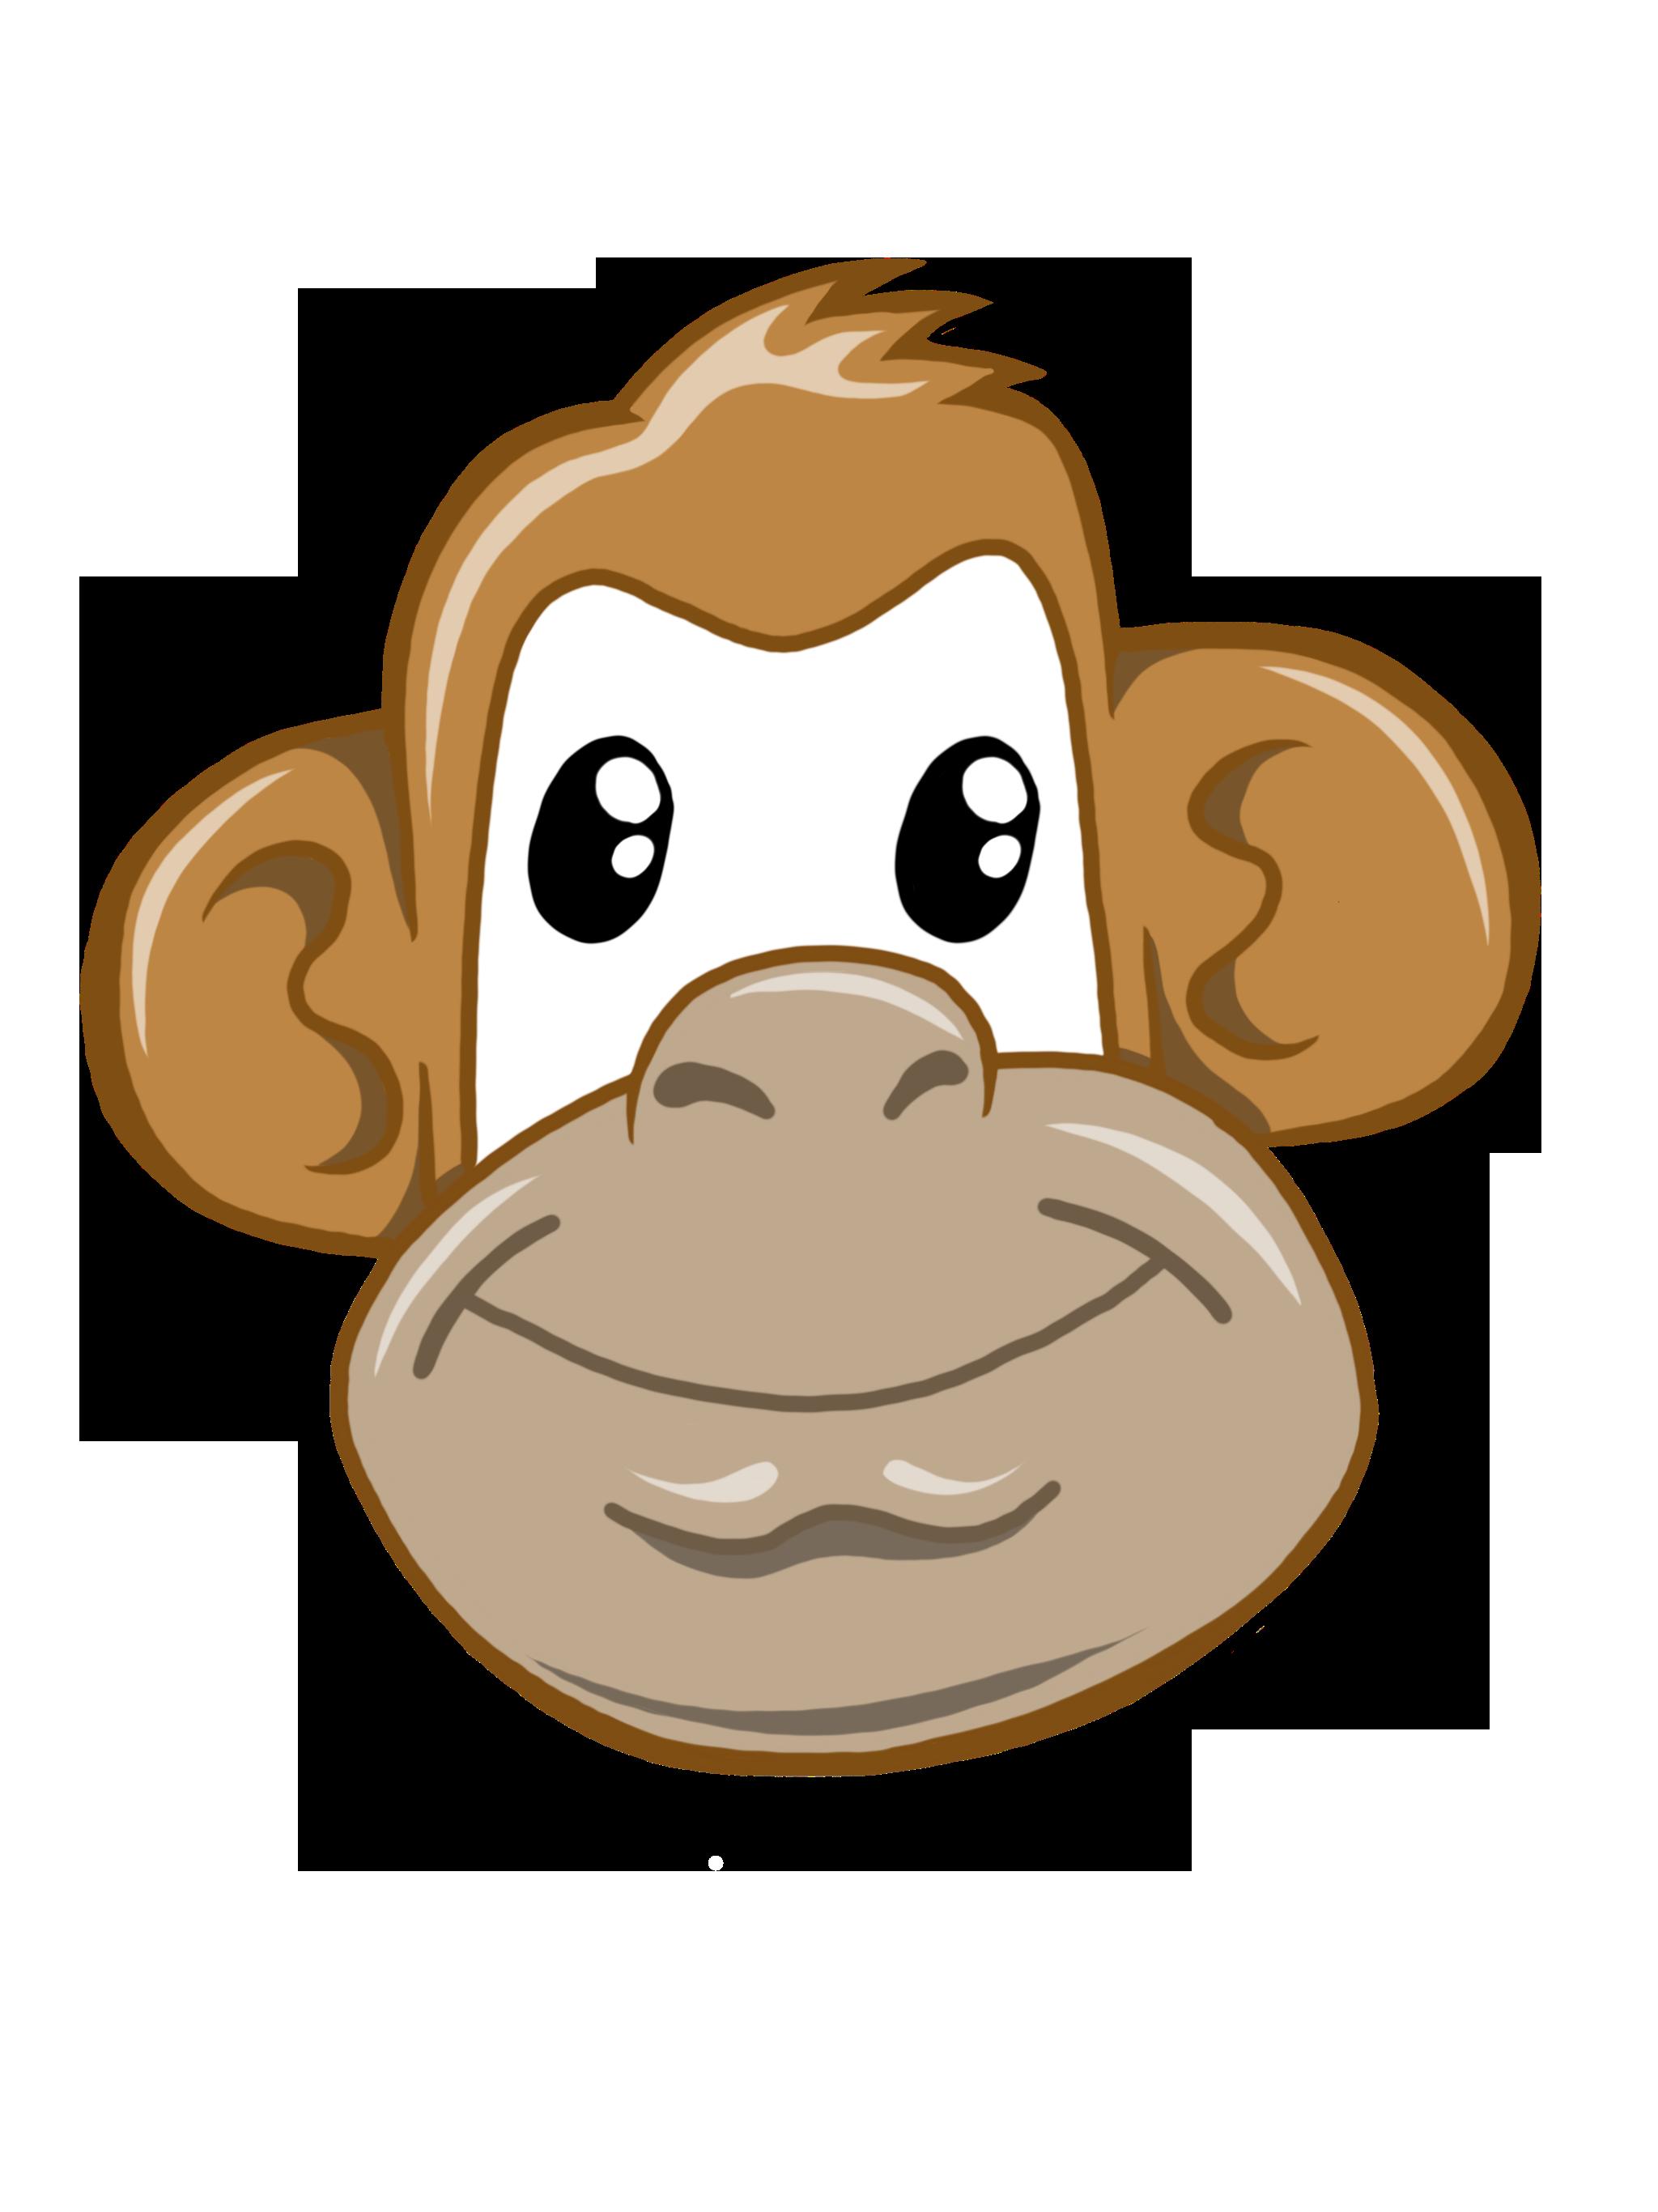 Monkey-face-1